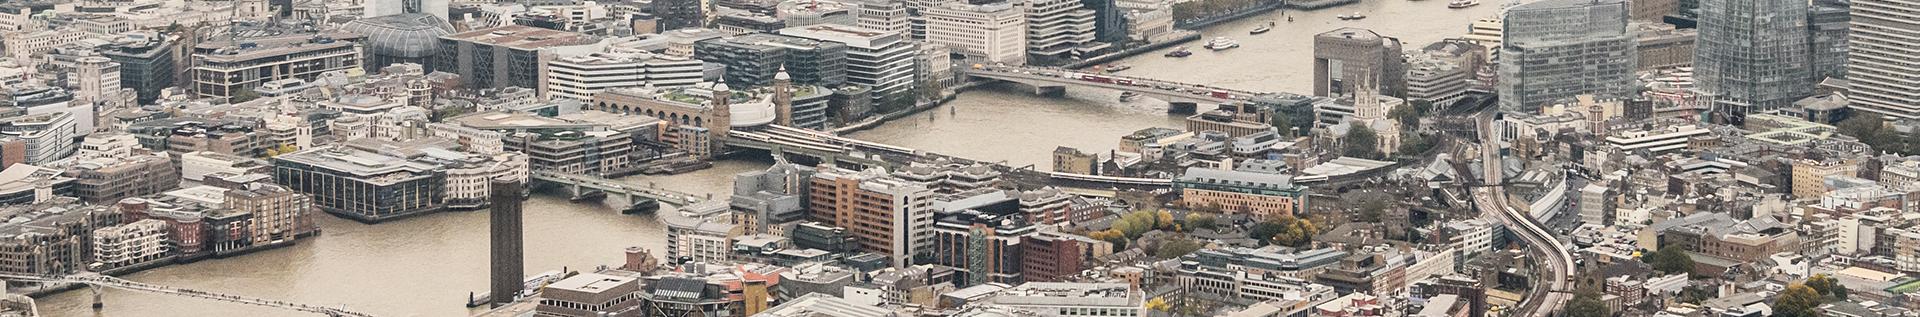 Trafalgar - About - Divider Image - London, England